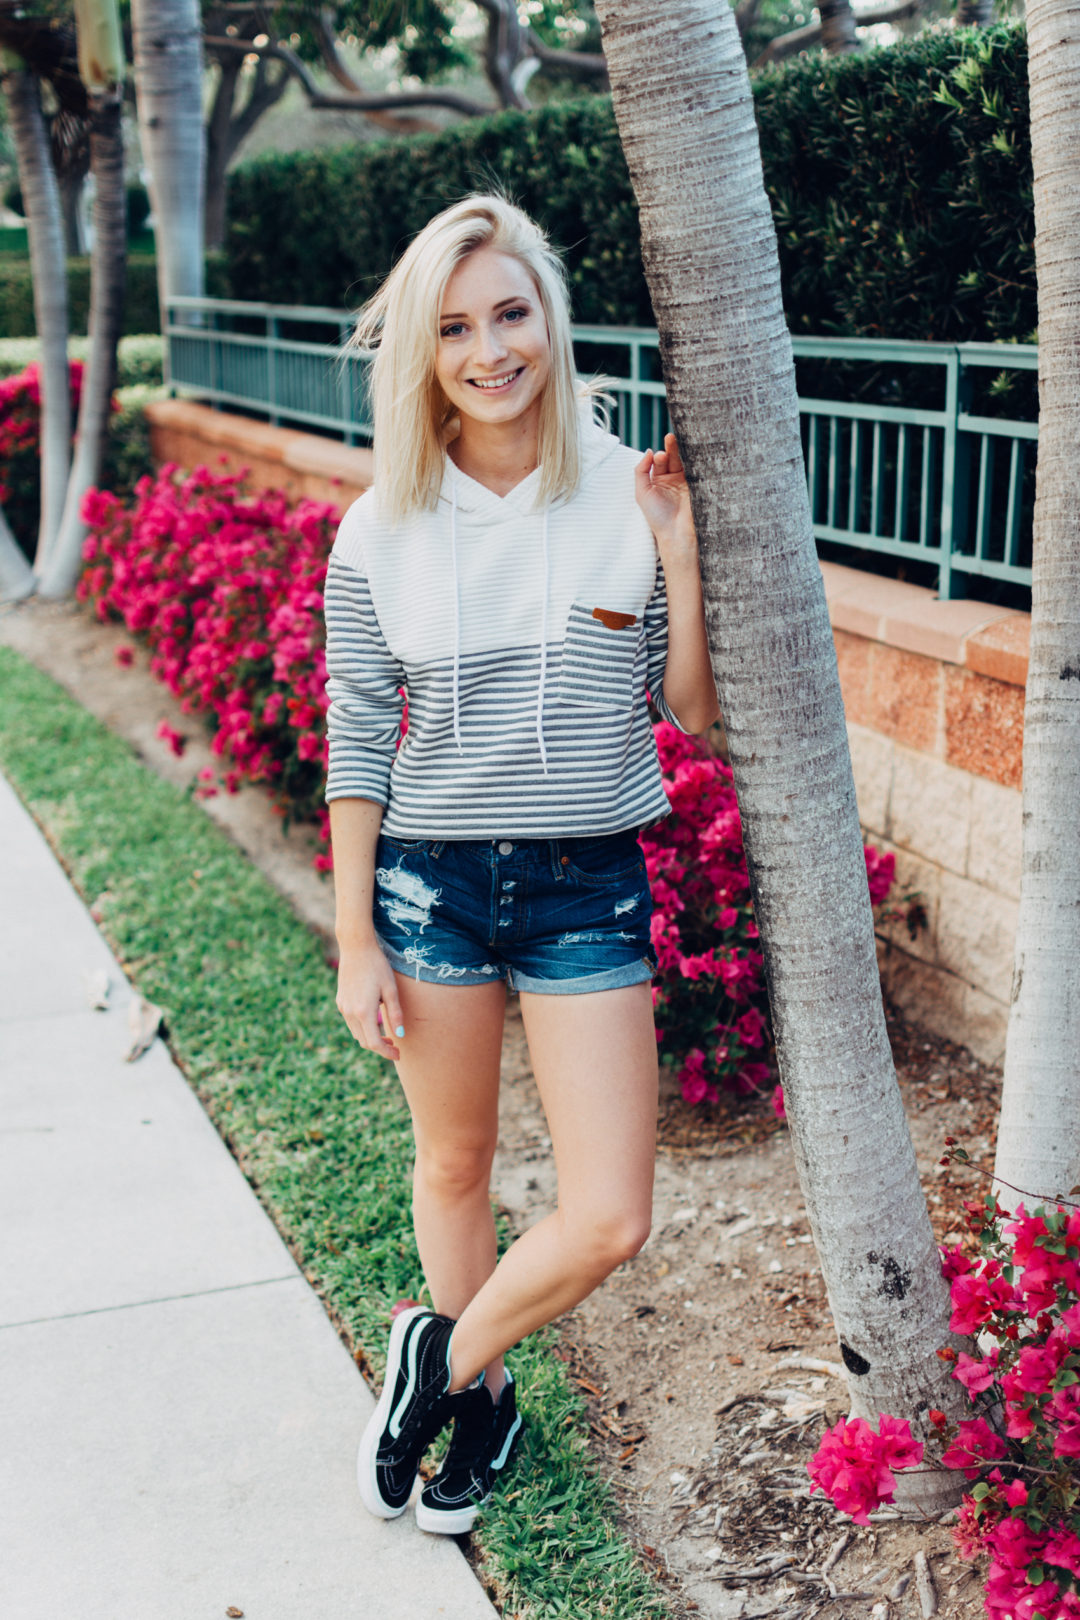 Jenny of Sweet Teal wearing striped Romwe sweatshirt, Levi's, and Vans